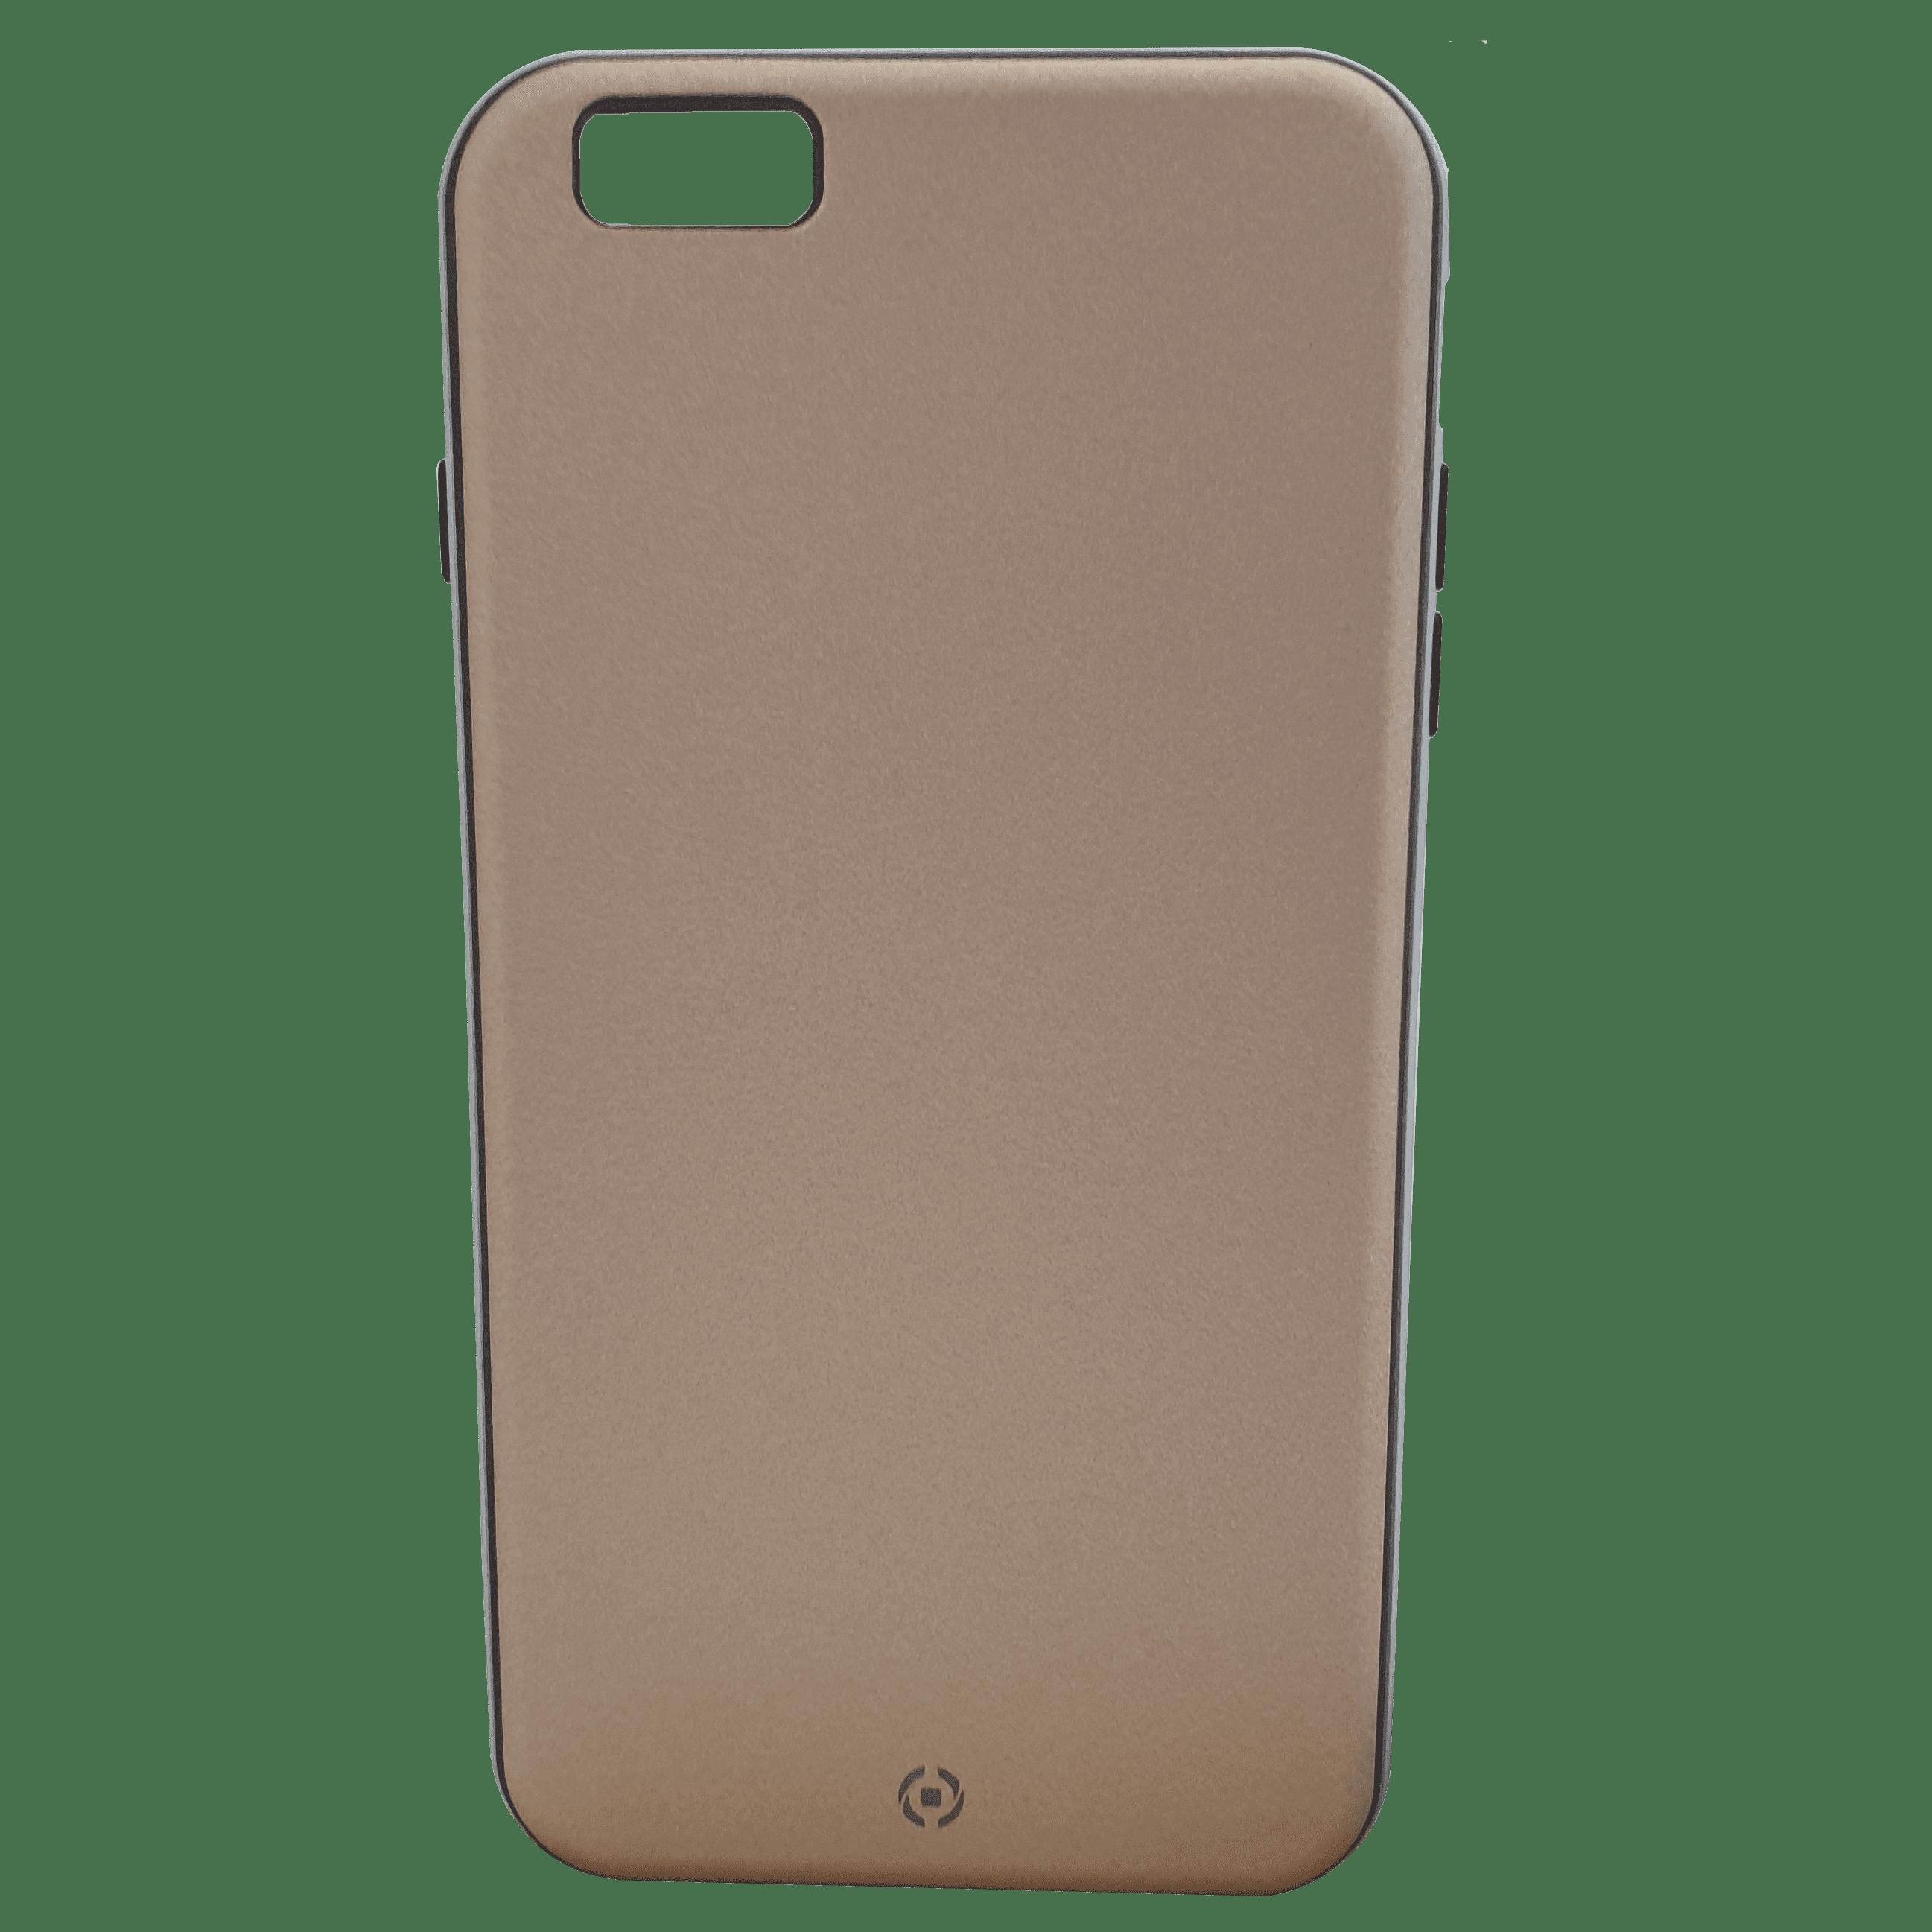 Mobilskal iPhone 6+ Len Guld